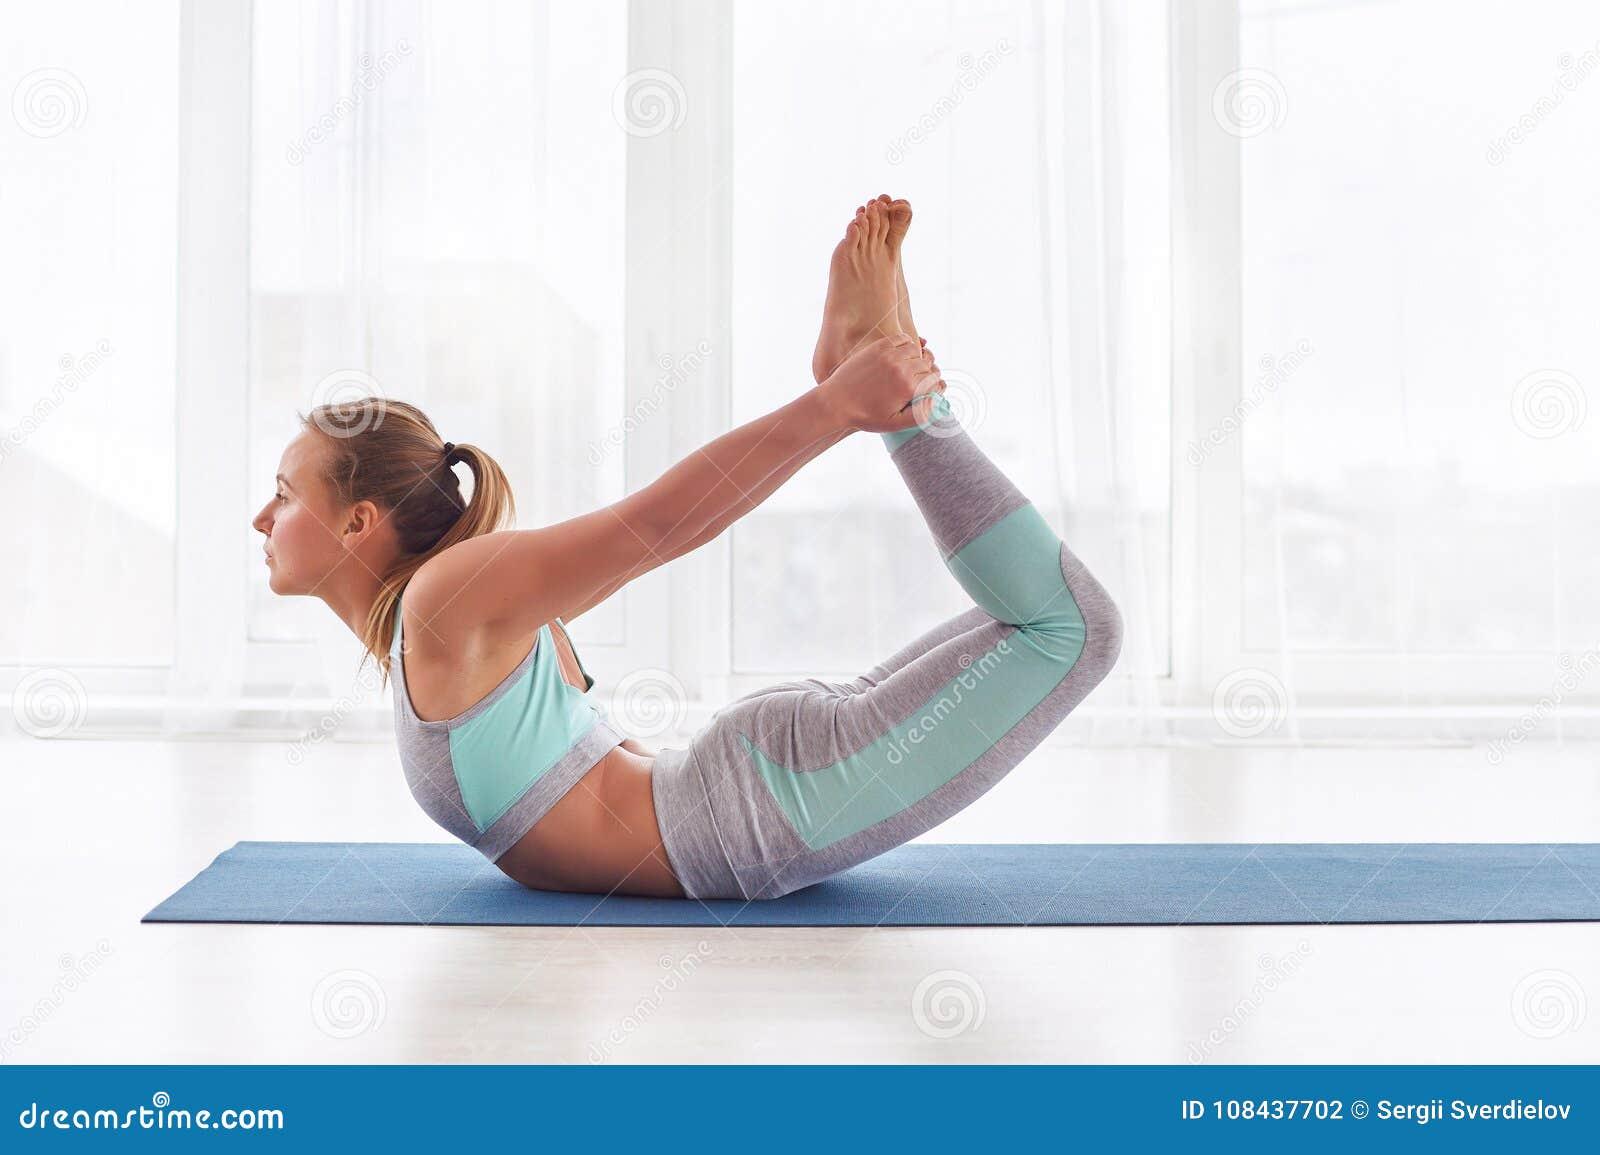 Beautiful Woman Practices Yoga Asana Dhanurasana - Bow Pose At The